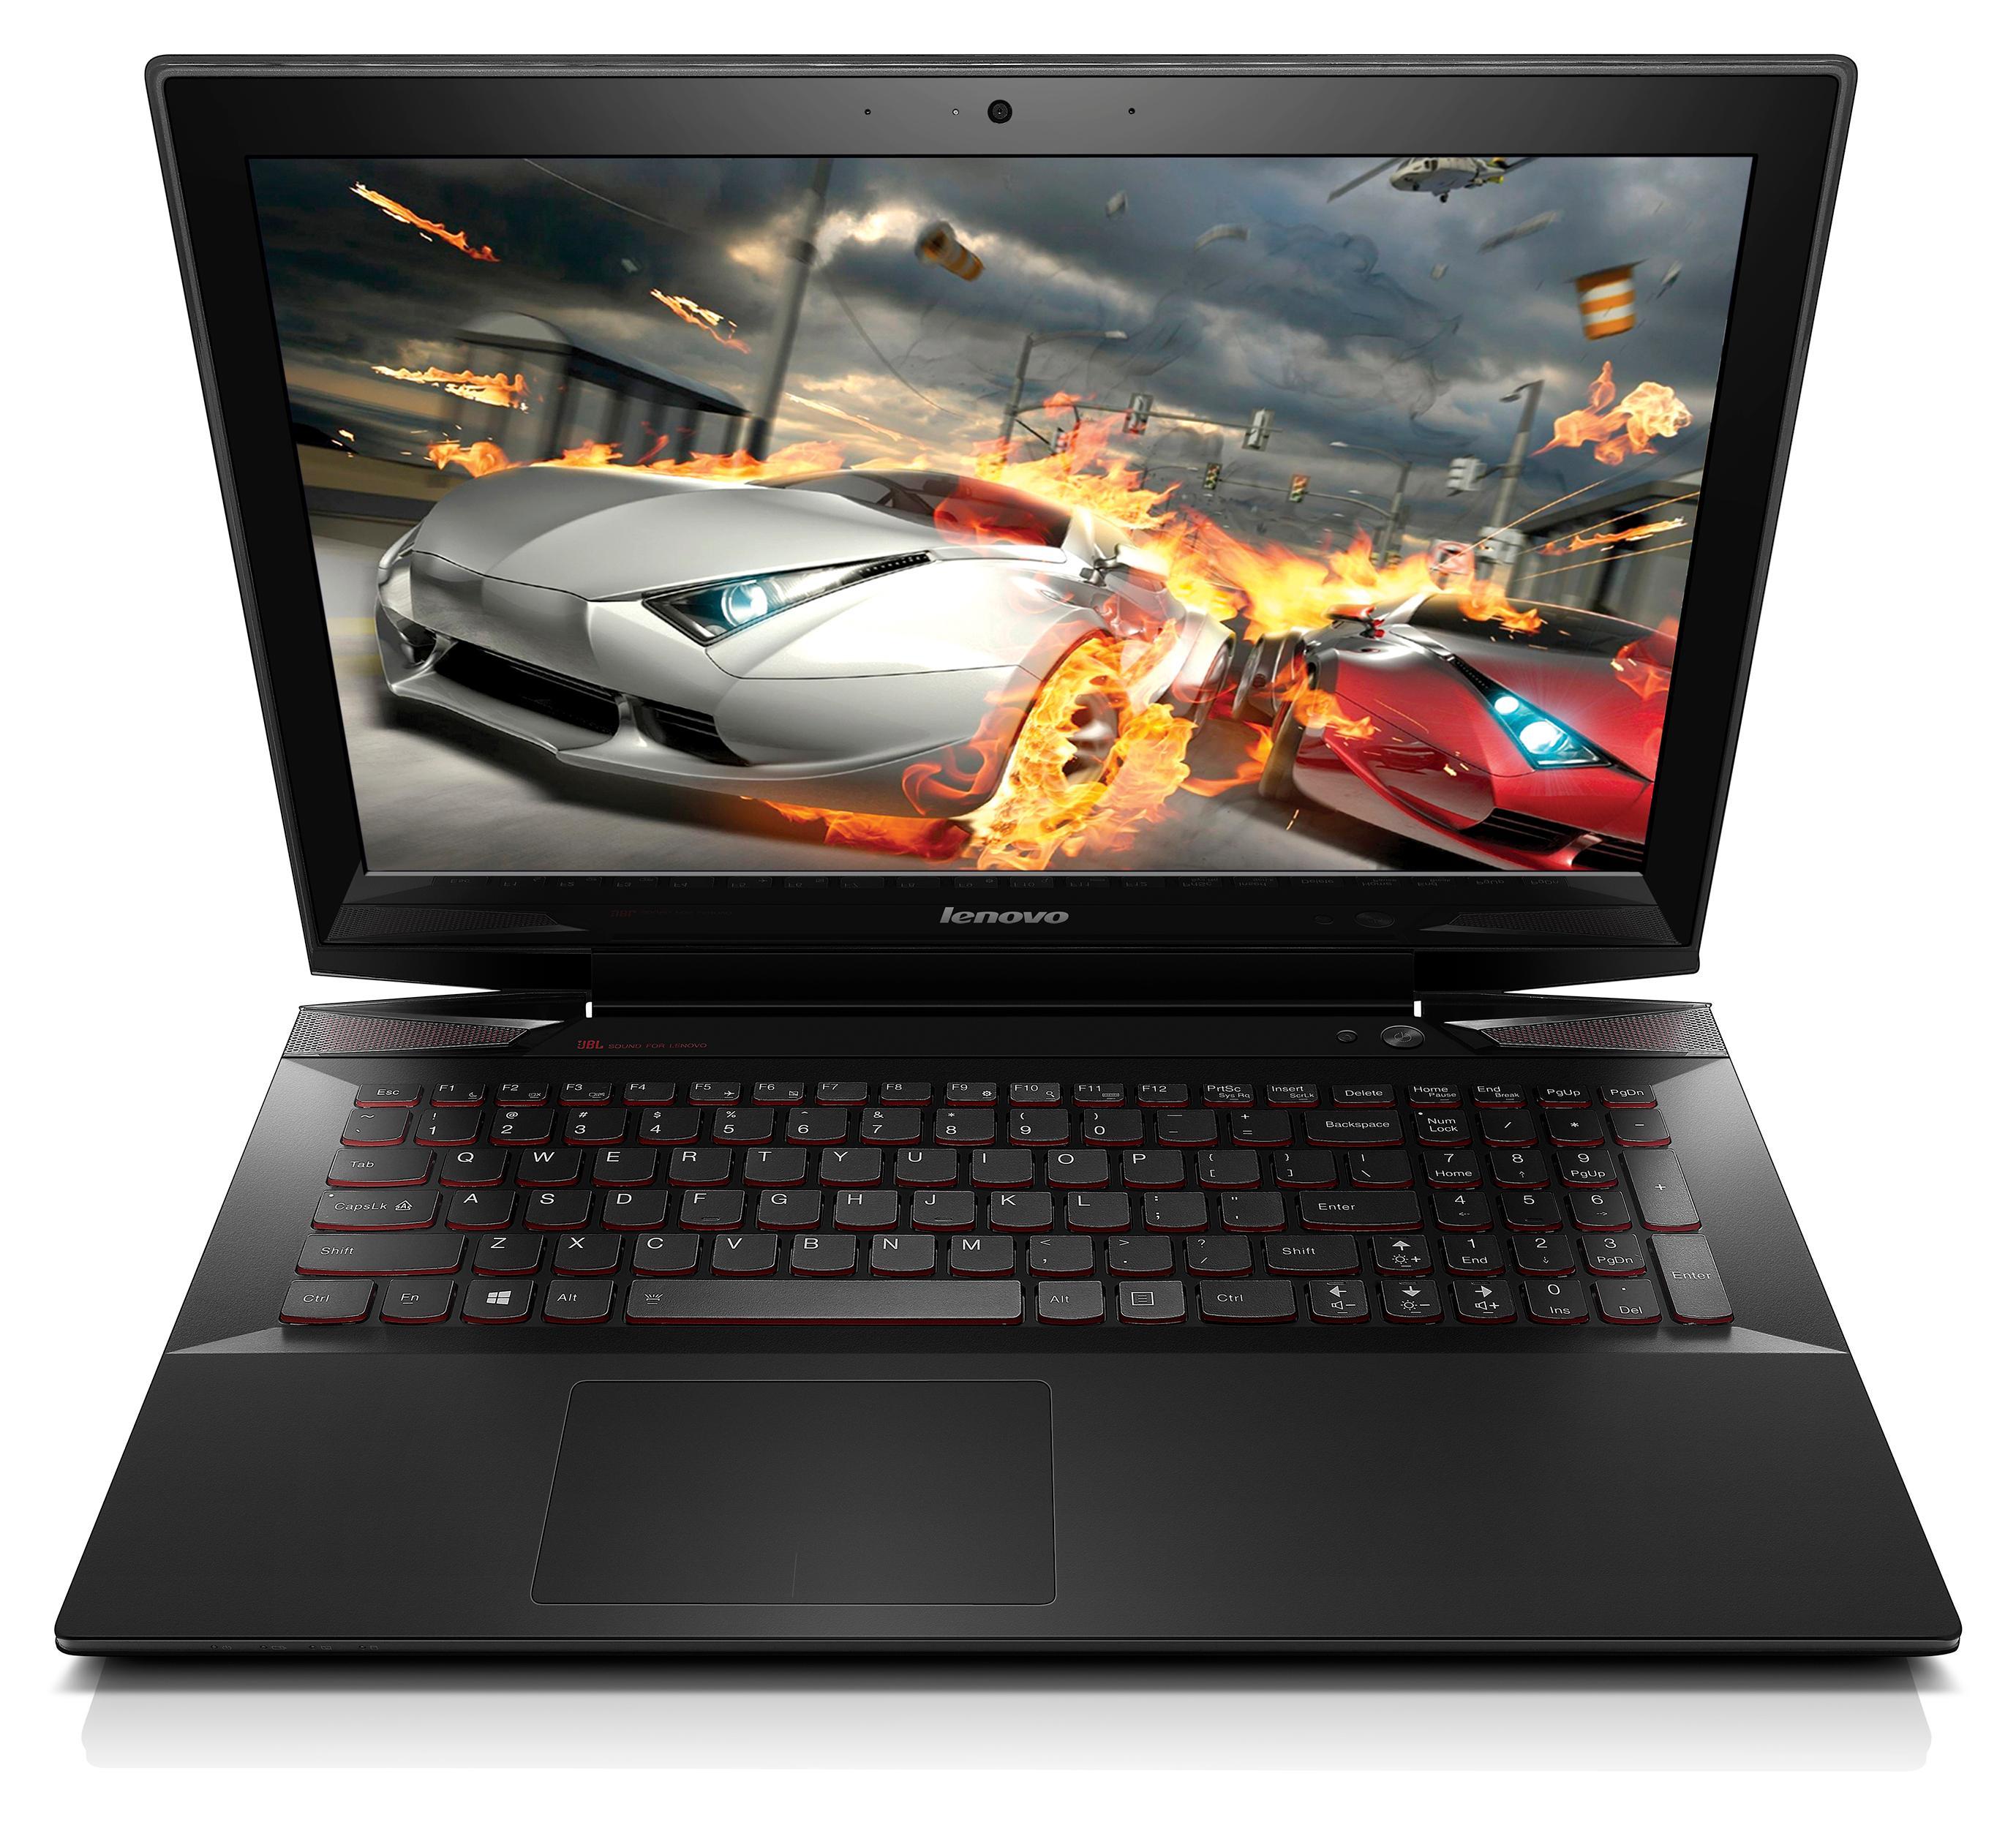 Amazon.com: Lenovo Y50 15.6-Inch Gaming Laptop (Core i7, 8